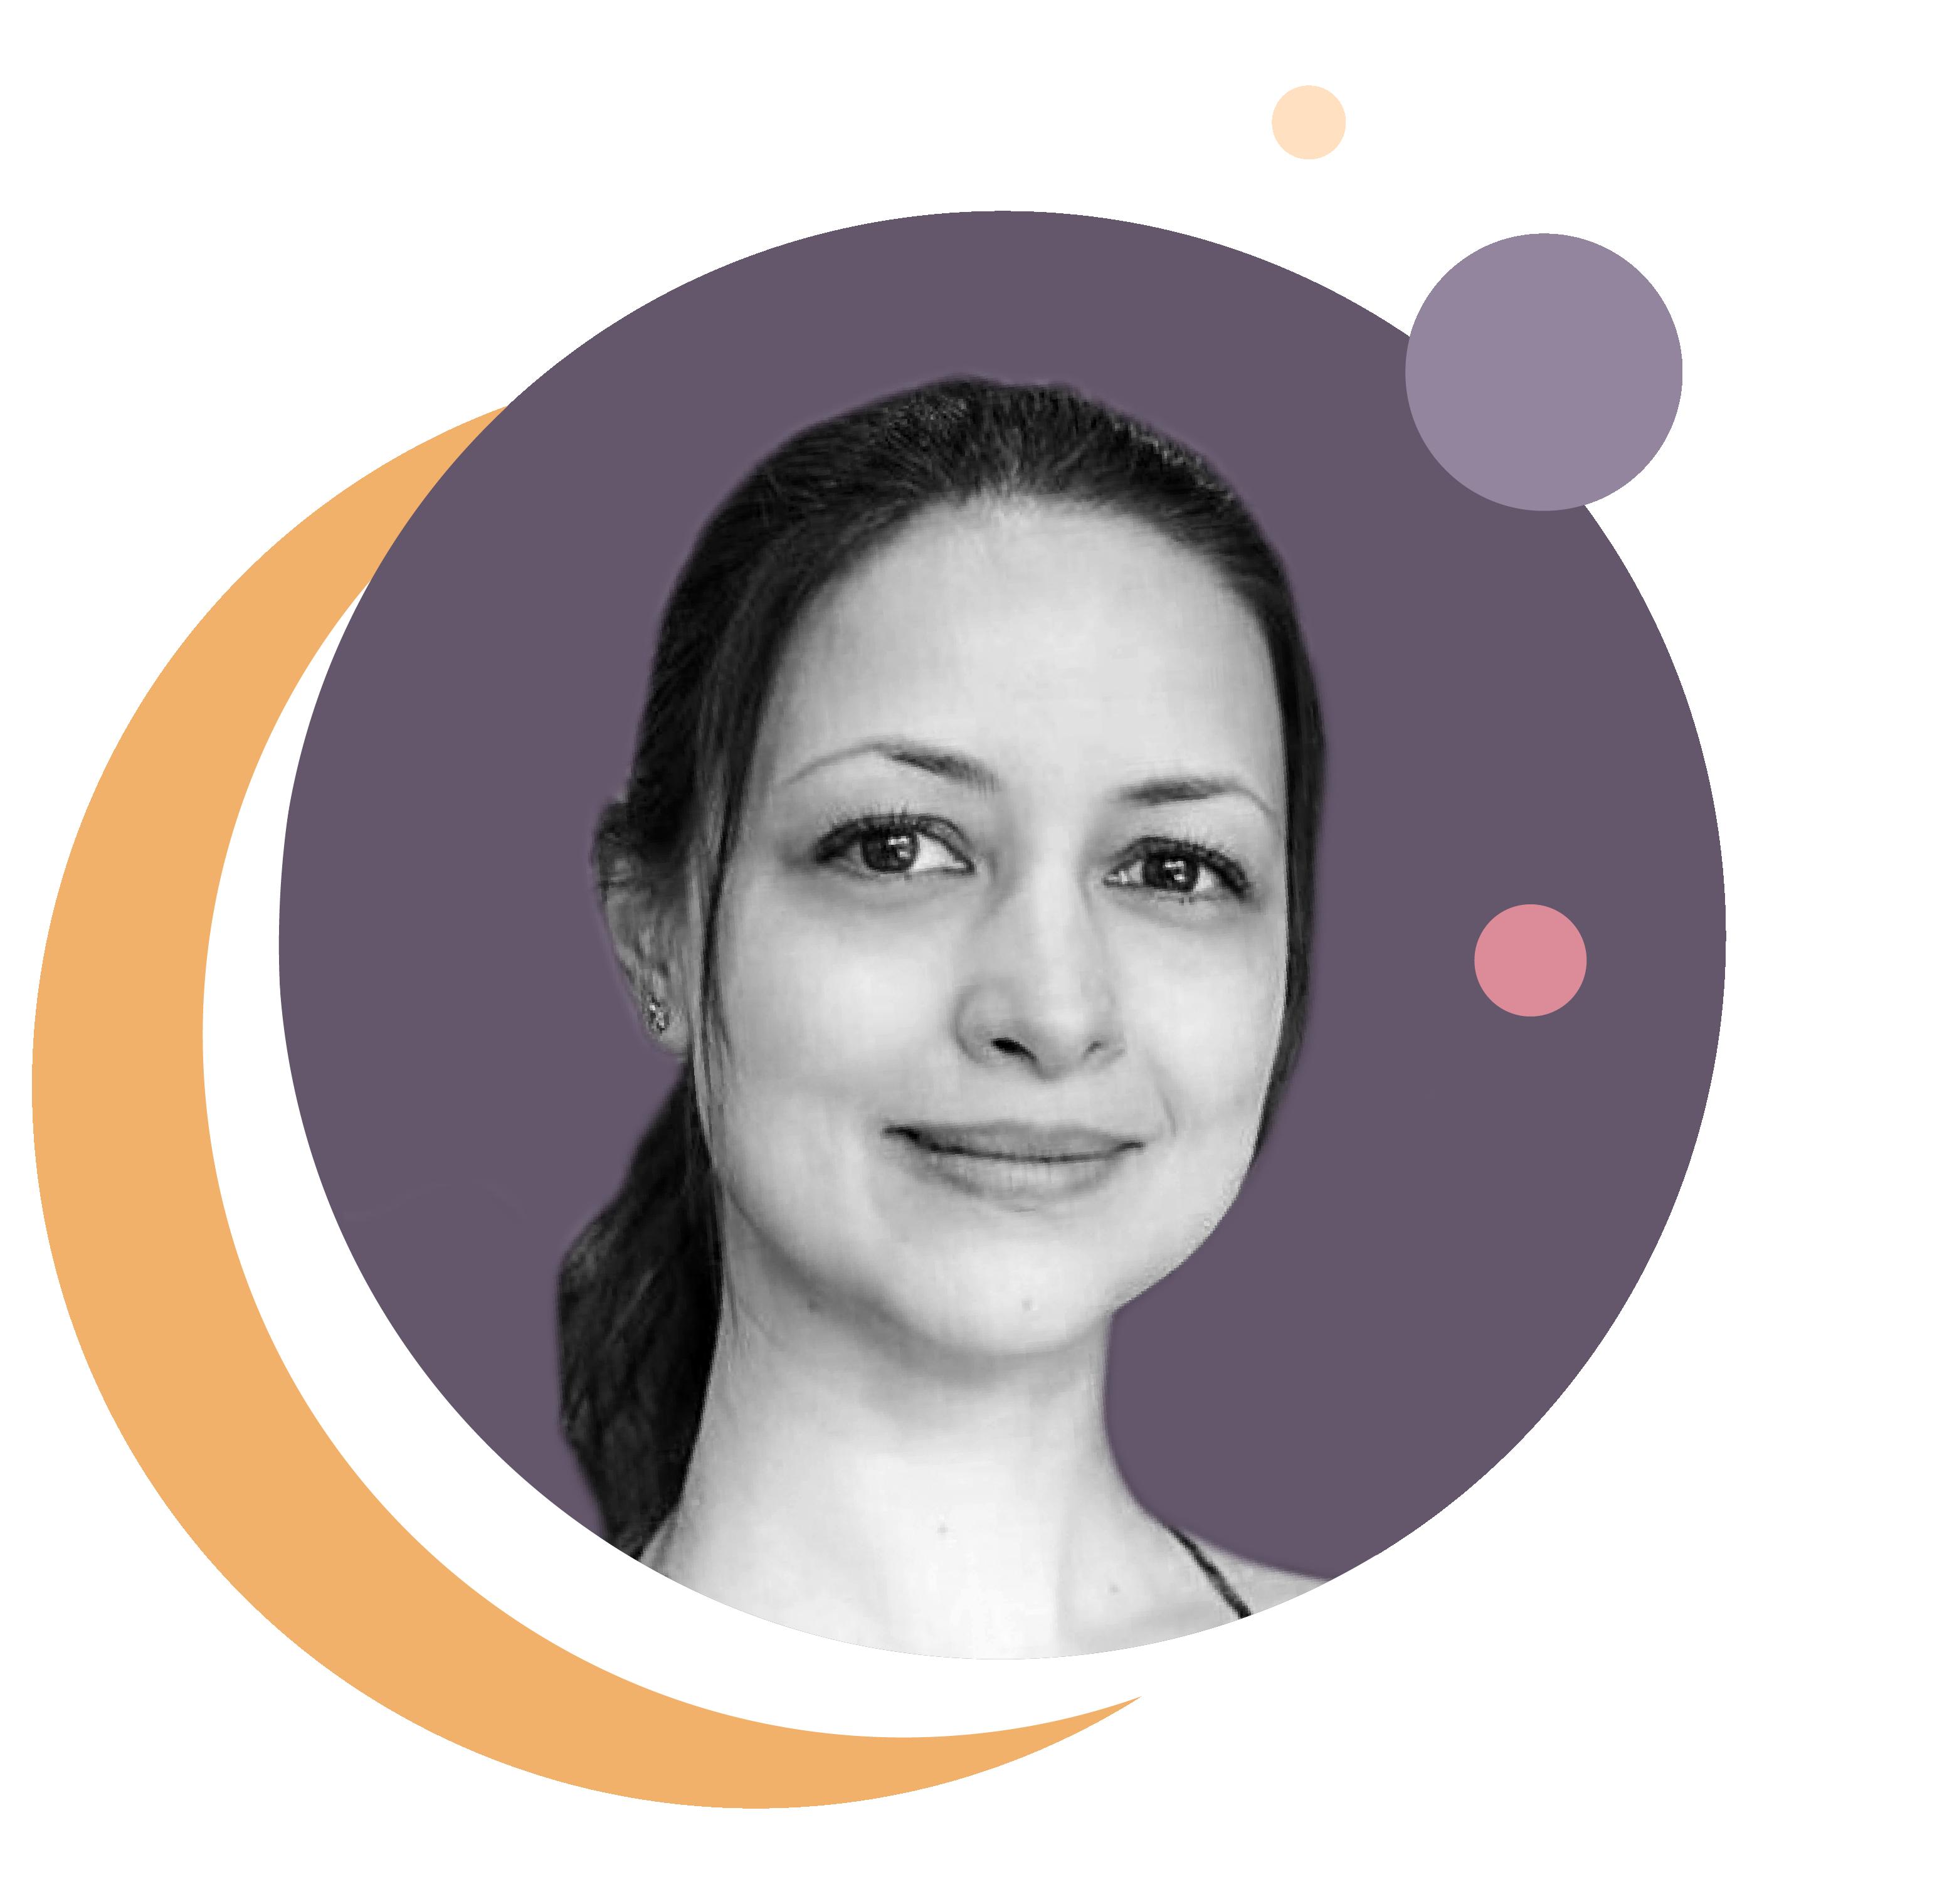 About Cristina, Head of customer success